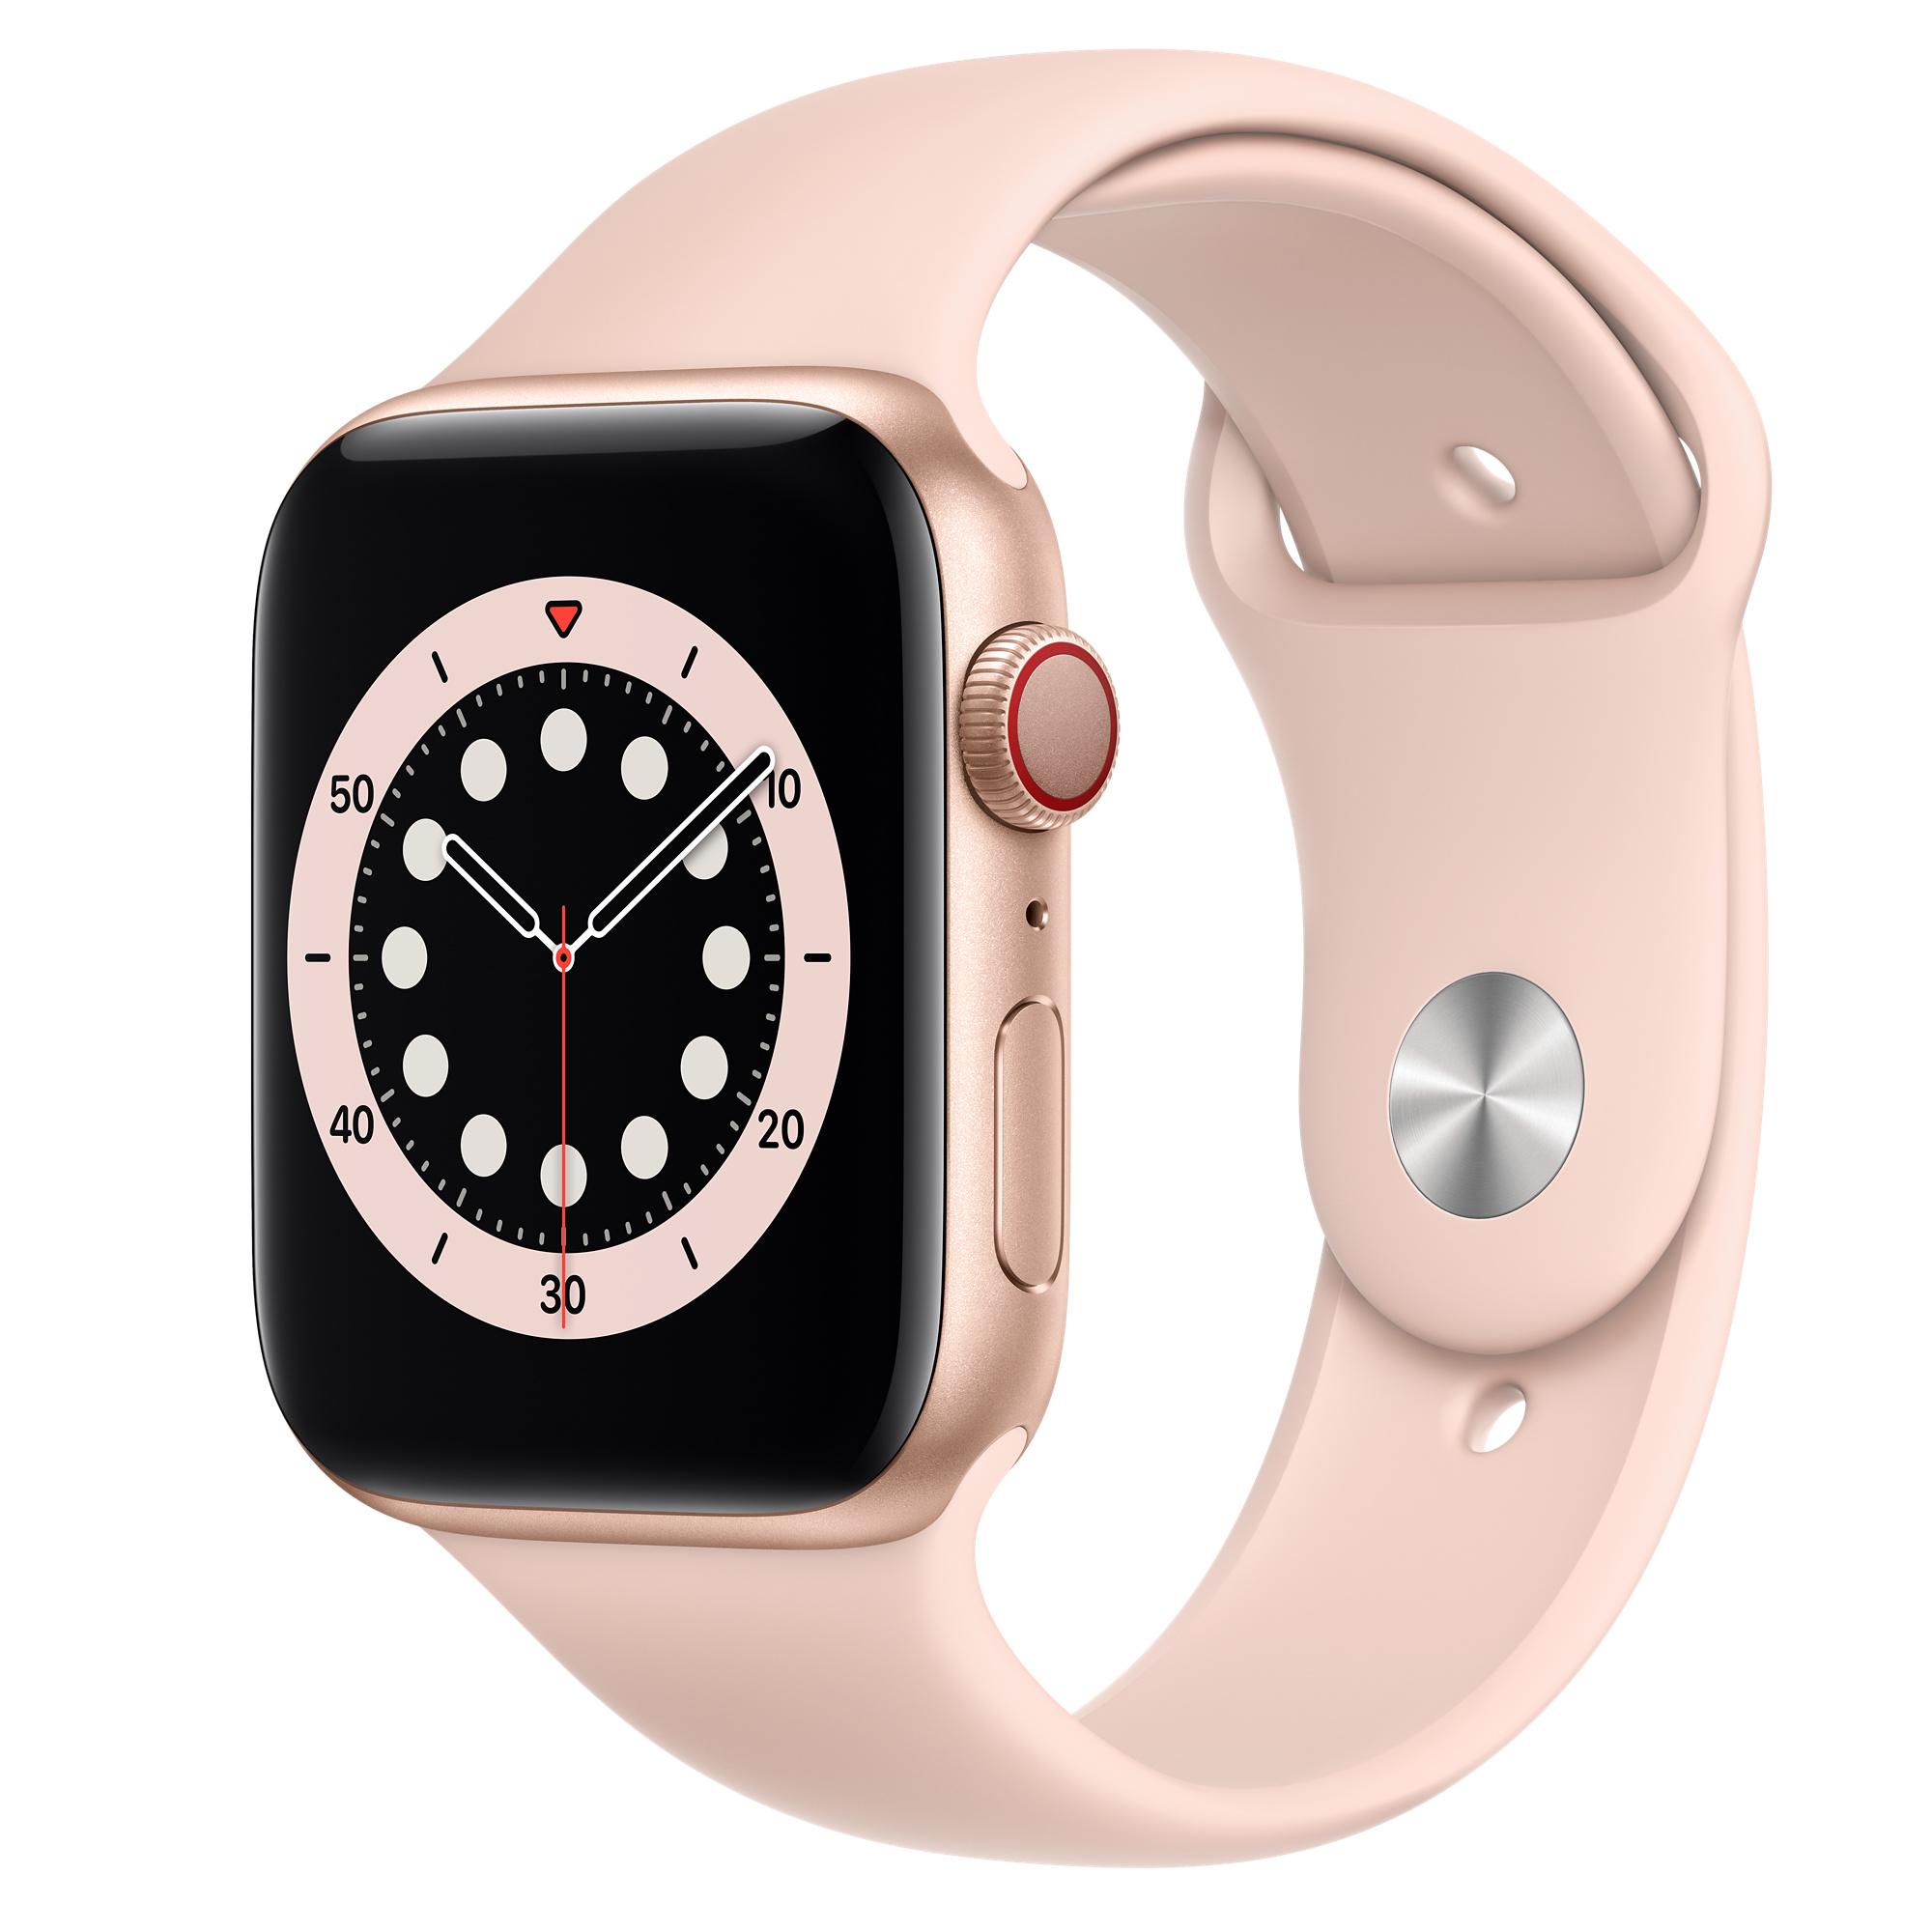 Apple Watch Series 6 Gps Cellular 44mm Gold Aluminium Case With Pink Sand Sport Band Regular Apple Uk